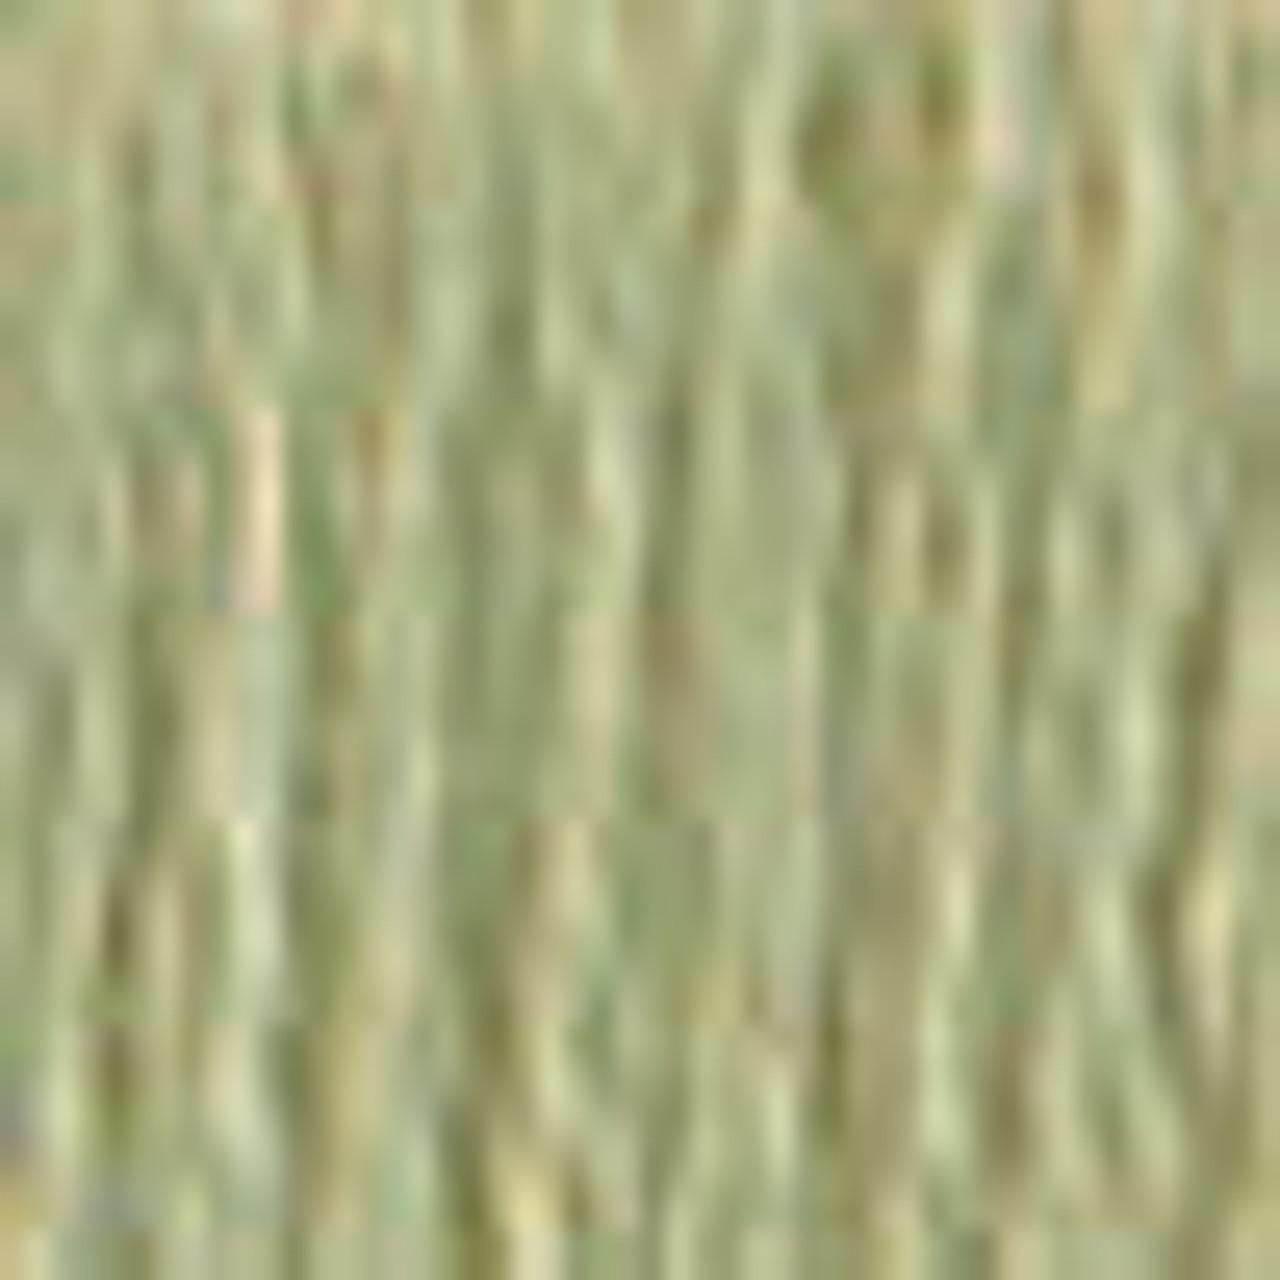 DMC # 3013 Light Khaki Green Floss / Thread